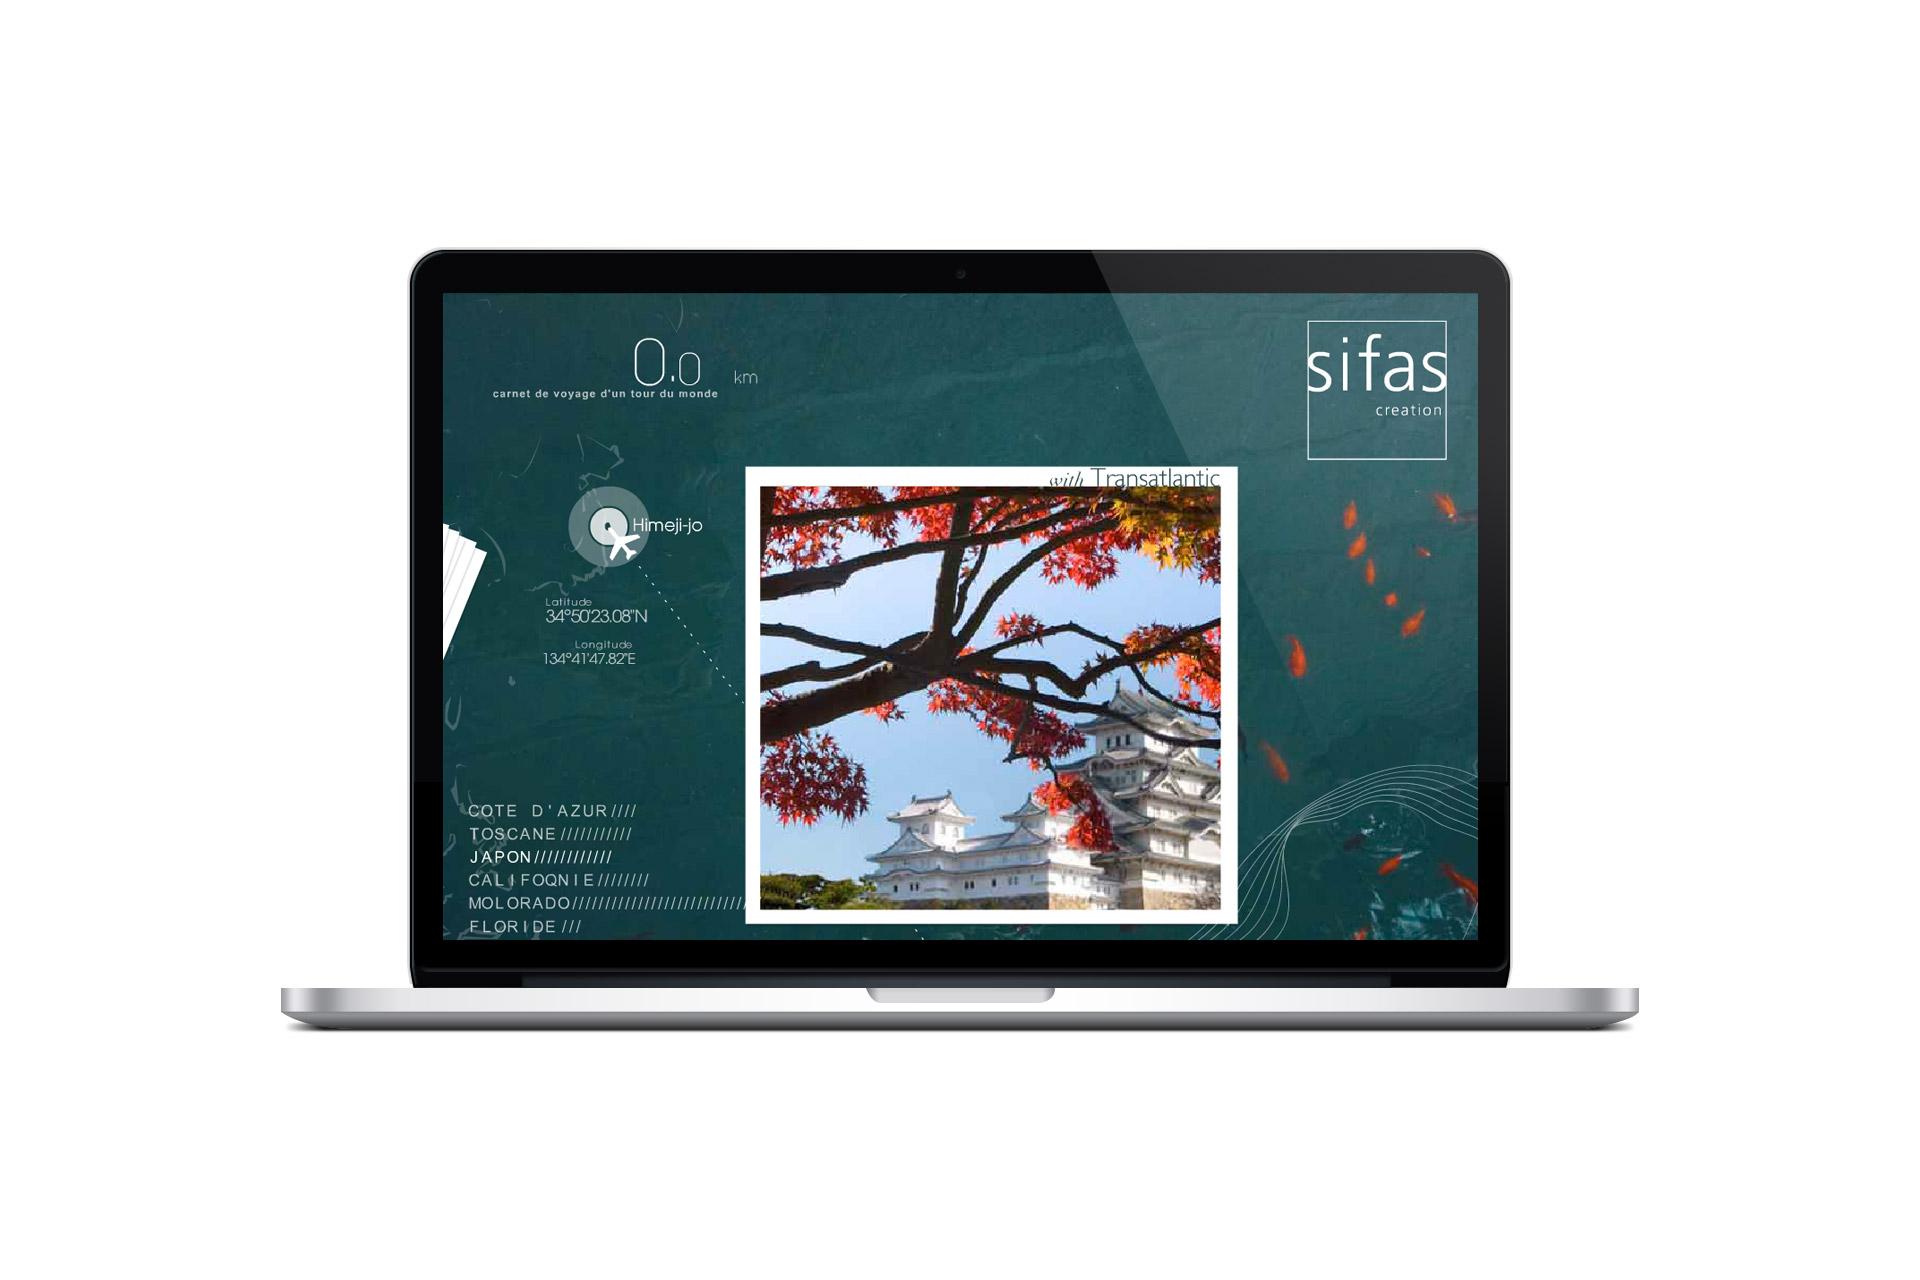 sifas-web021.jpg